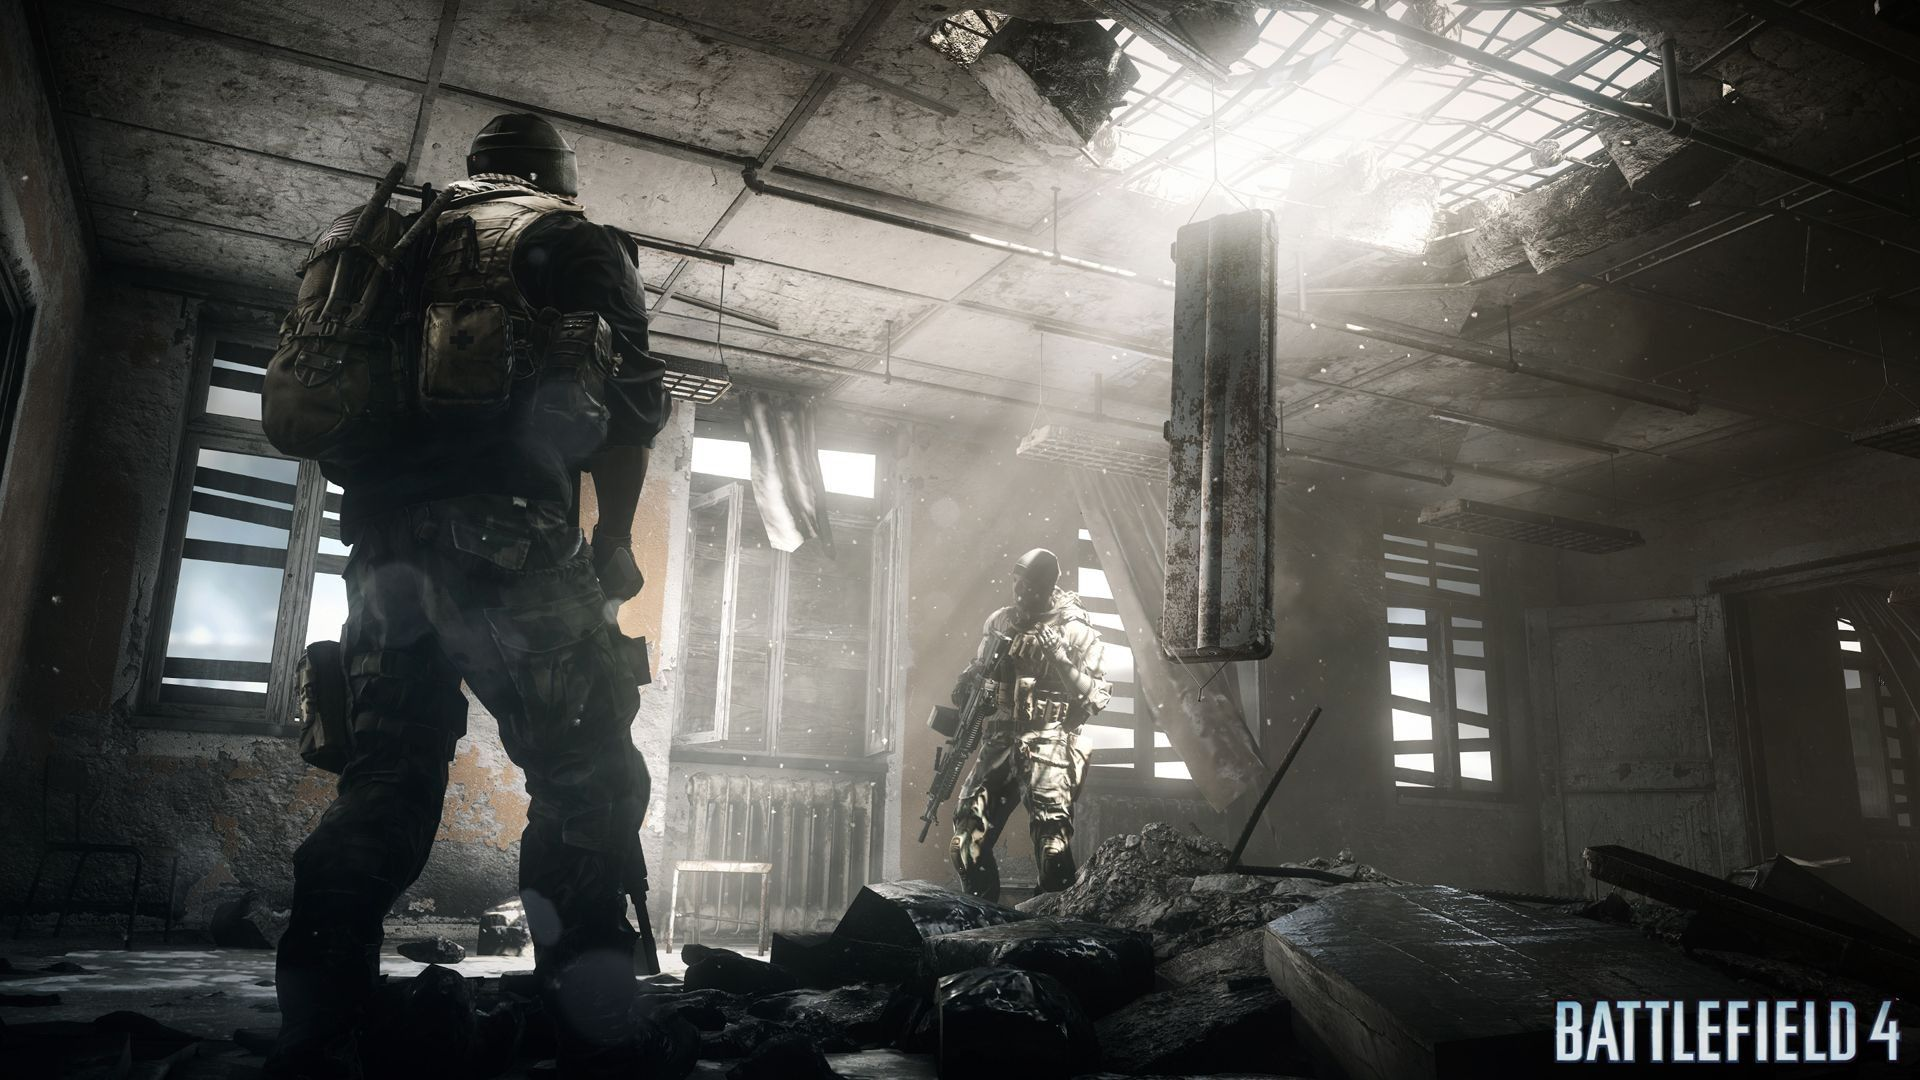 Battlefield 4 (PS4) - 13